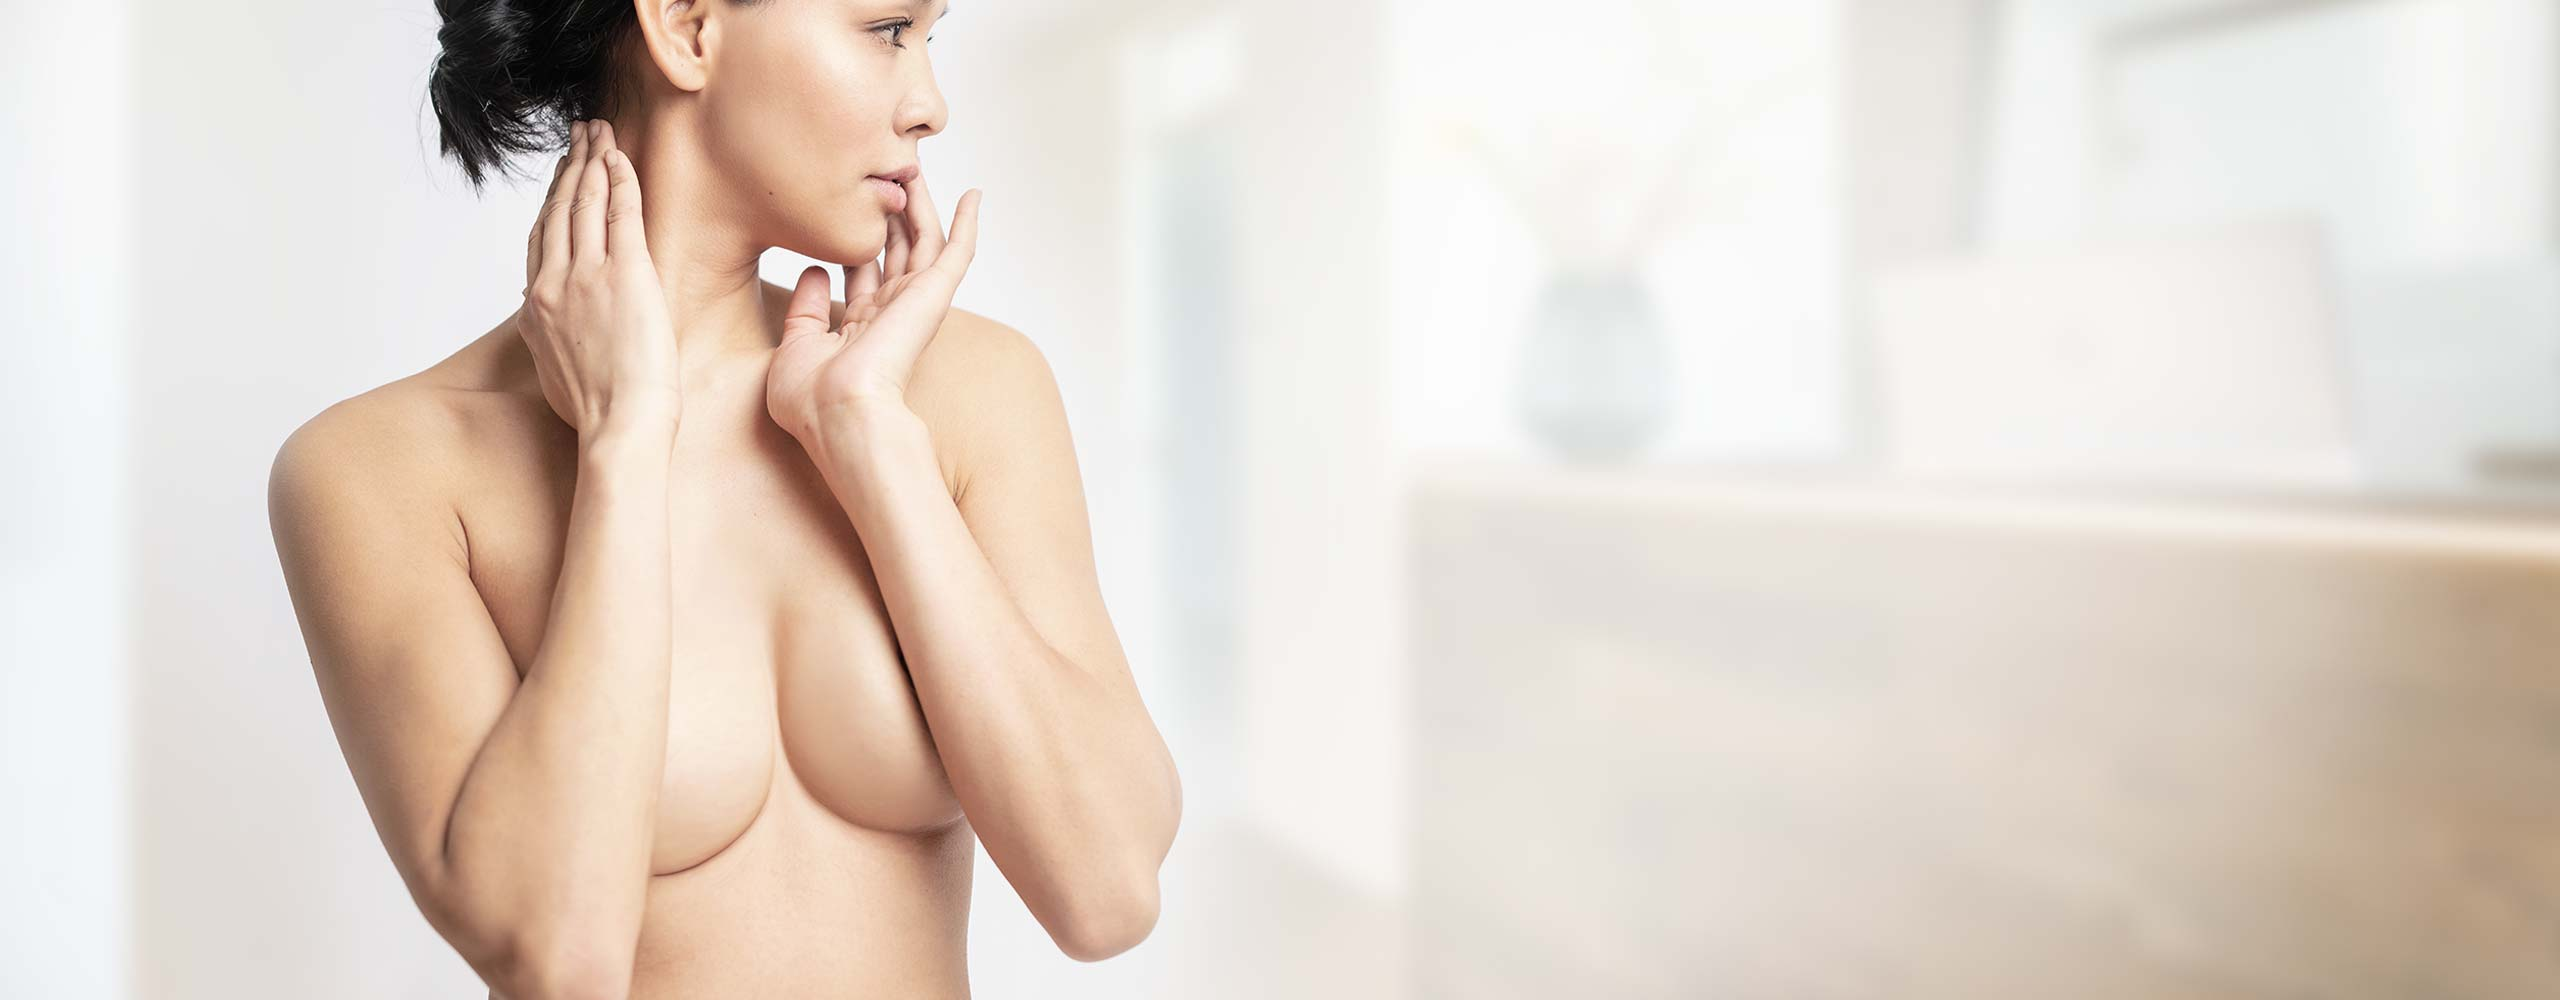 brustvergrosserung eigenfett proaesthetic